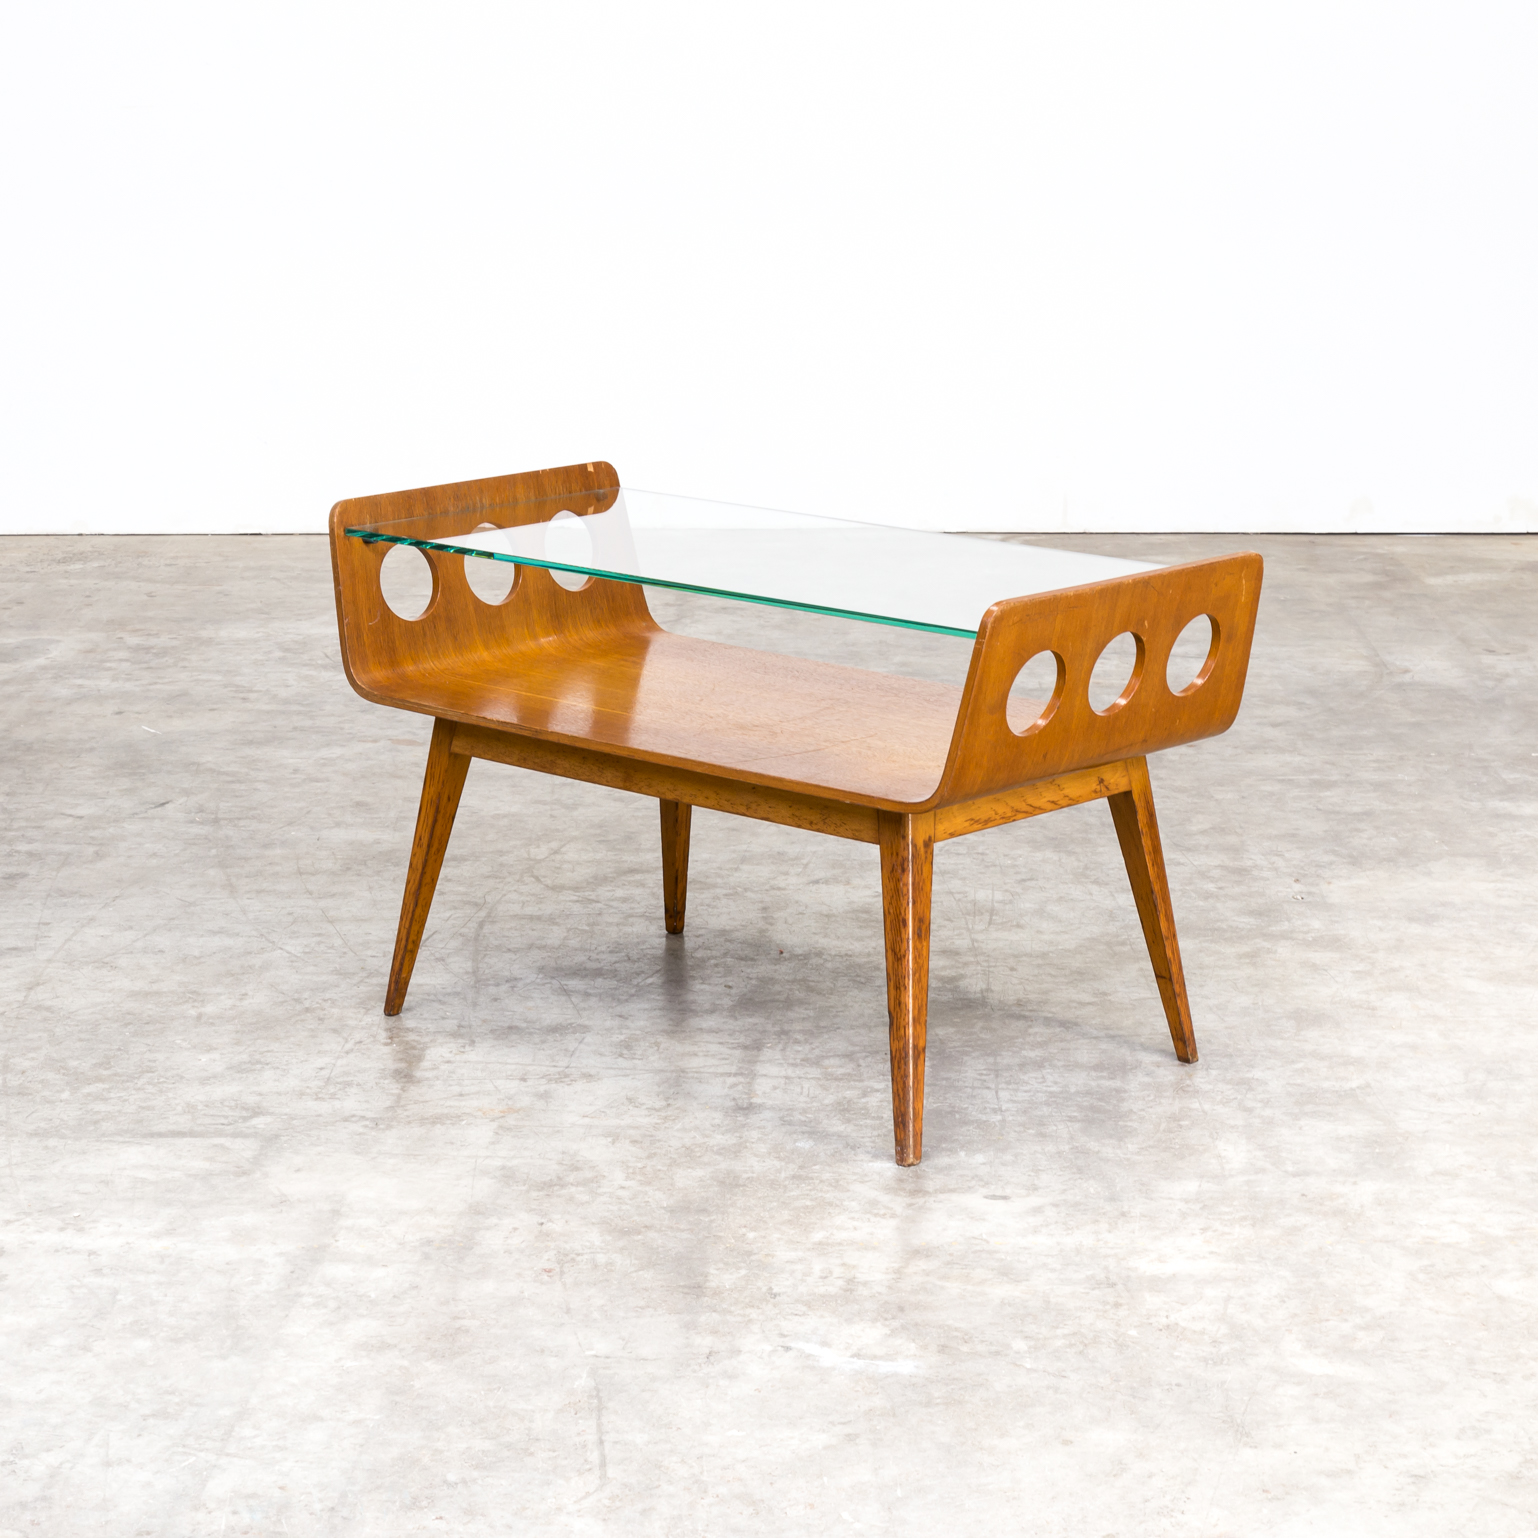 0225048tst cor alons coffee table bentwood glass salontafel vintage